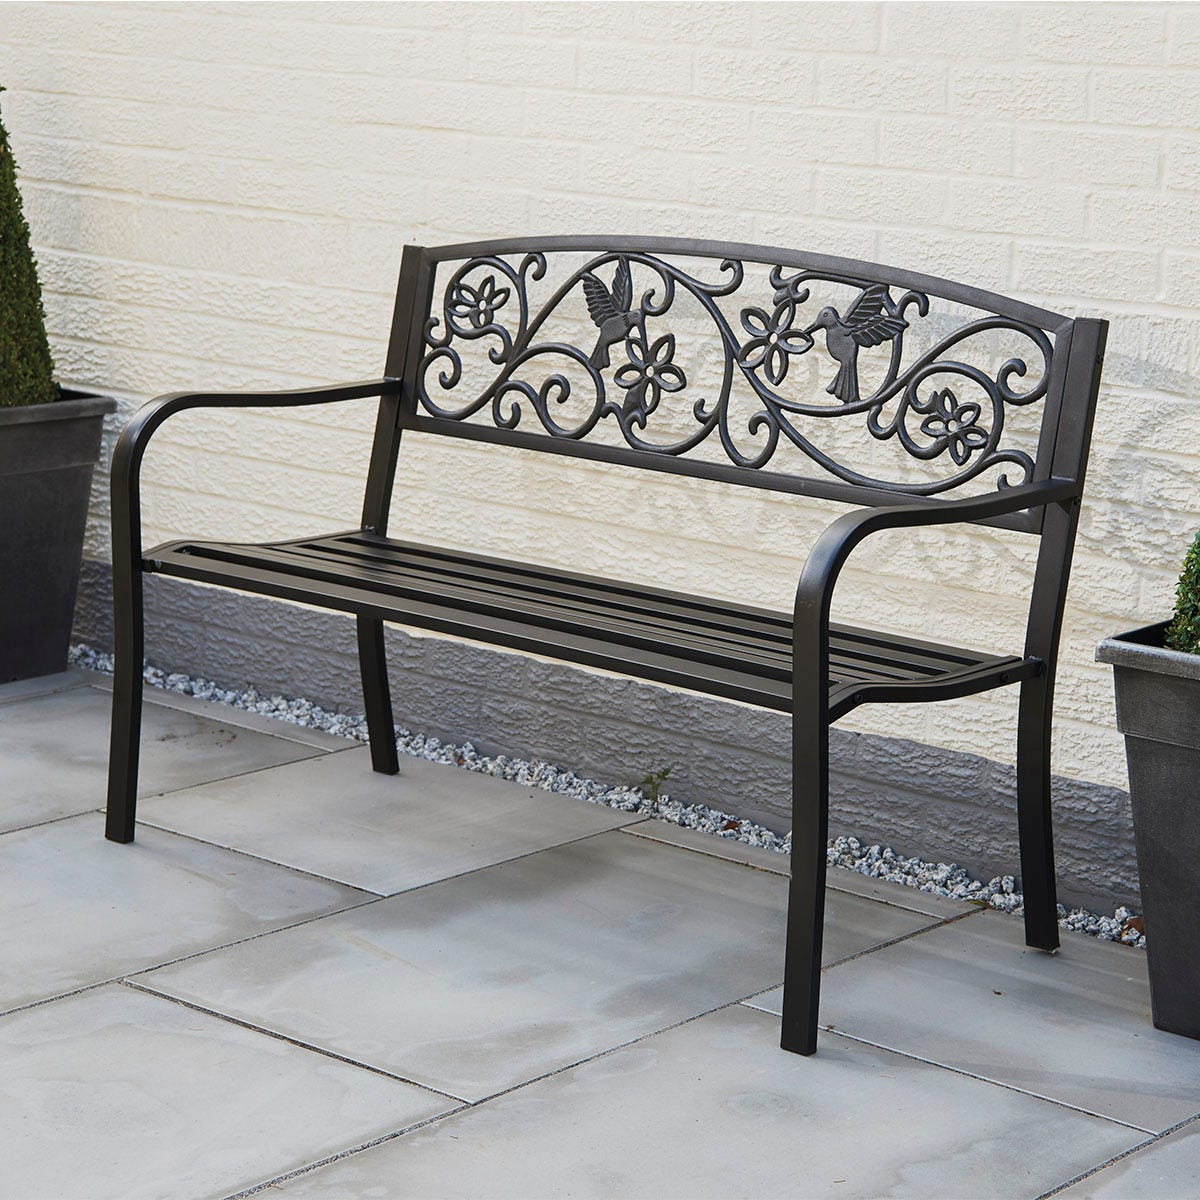 Greenhurst Hummingbird Garden Bench - Satin Black